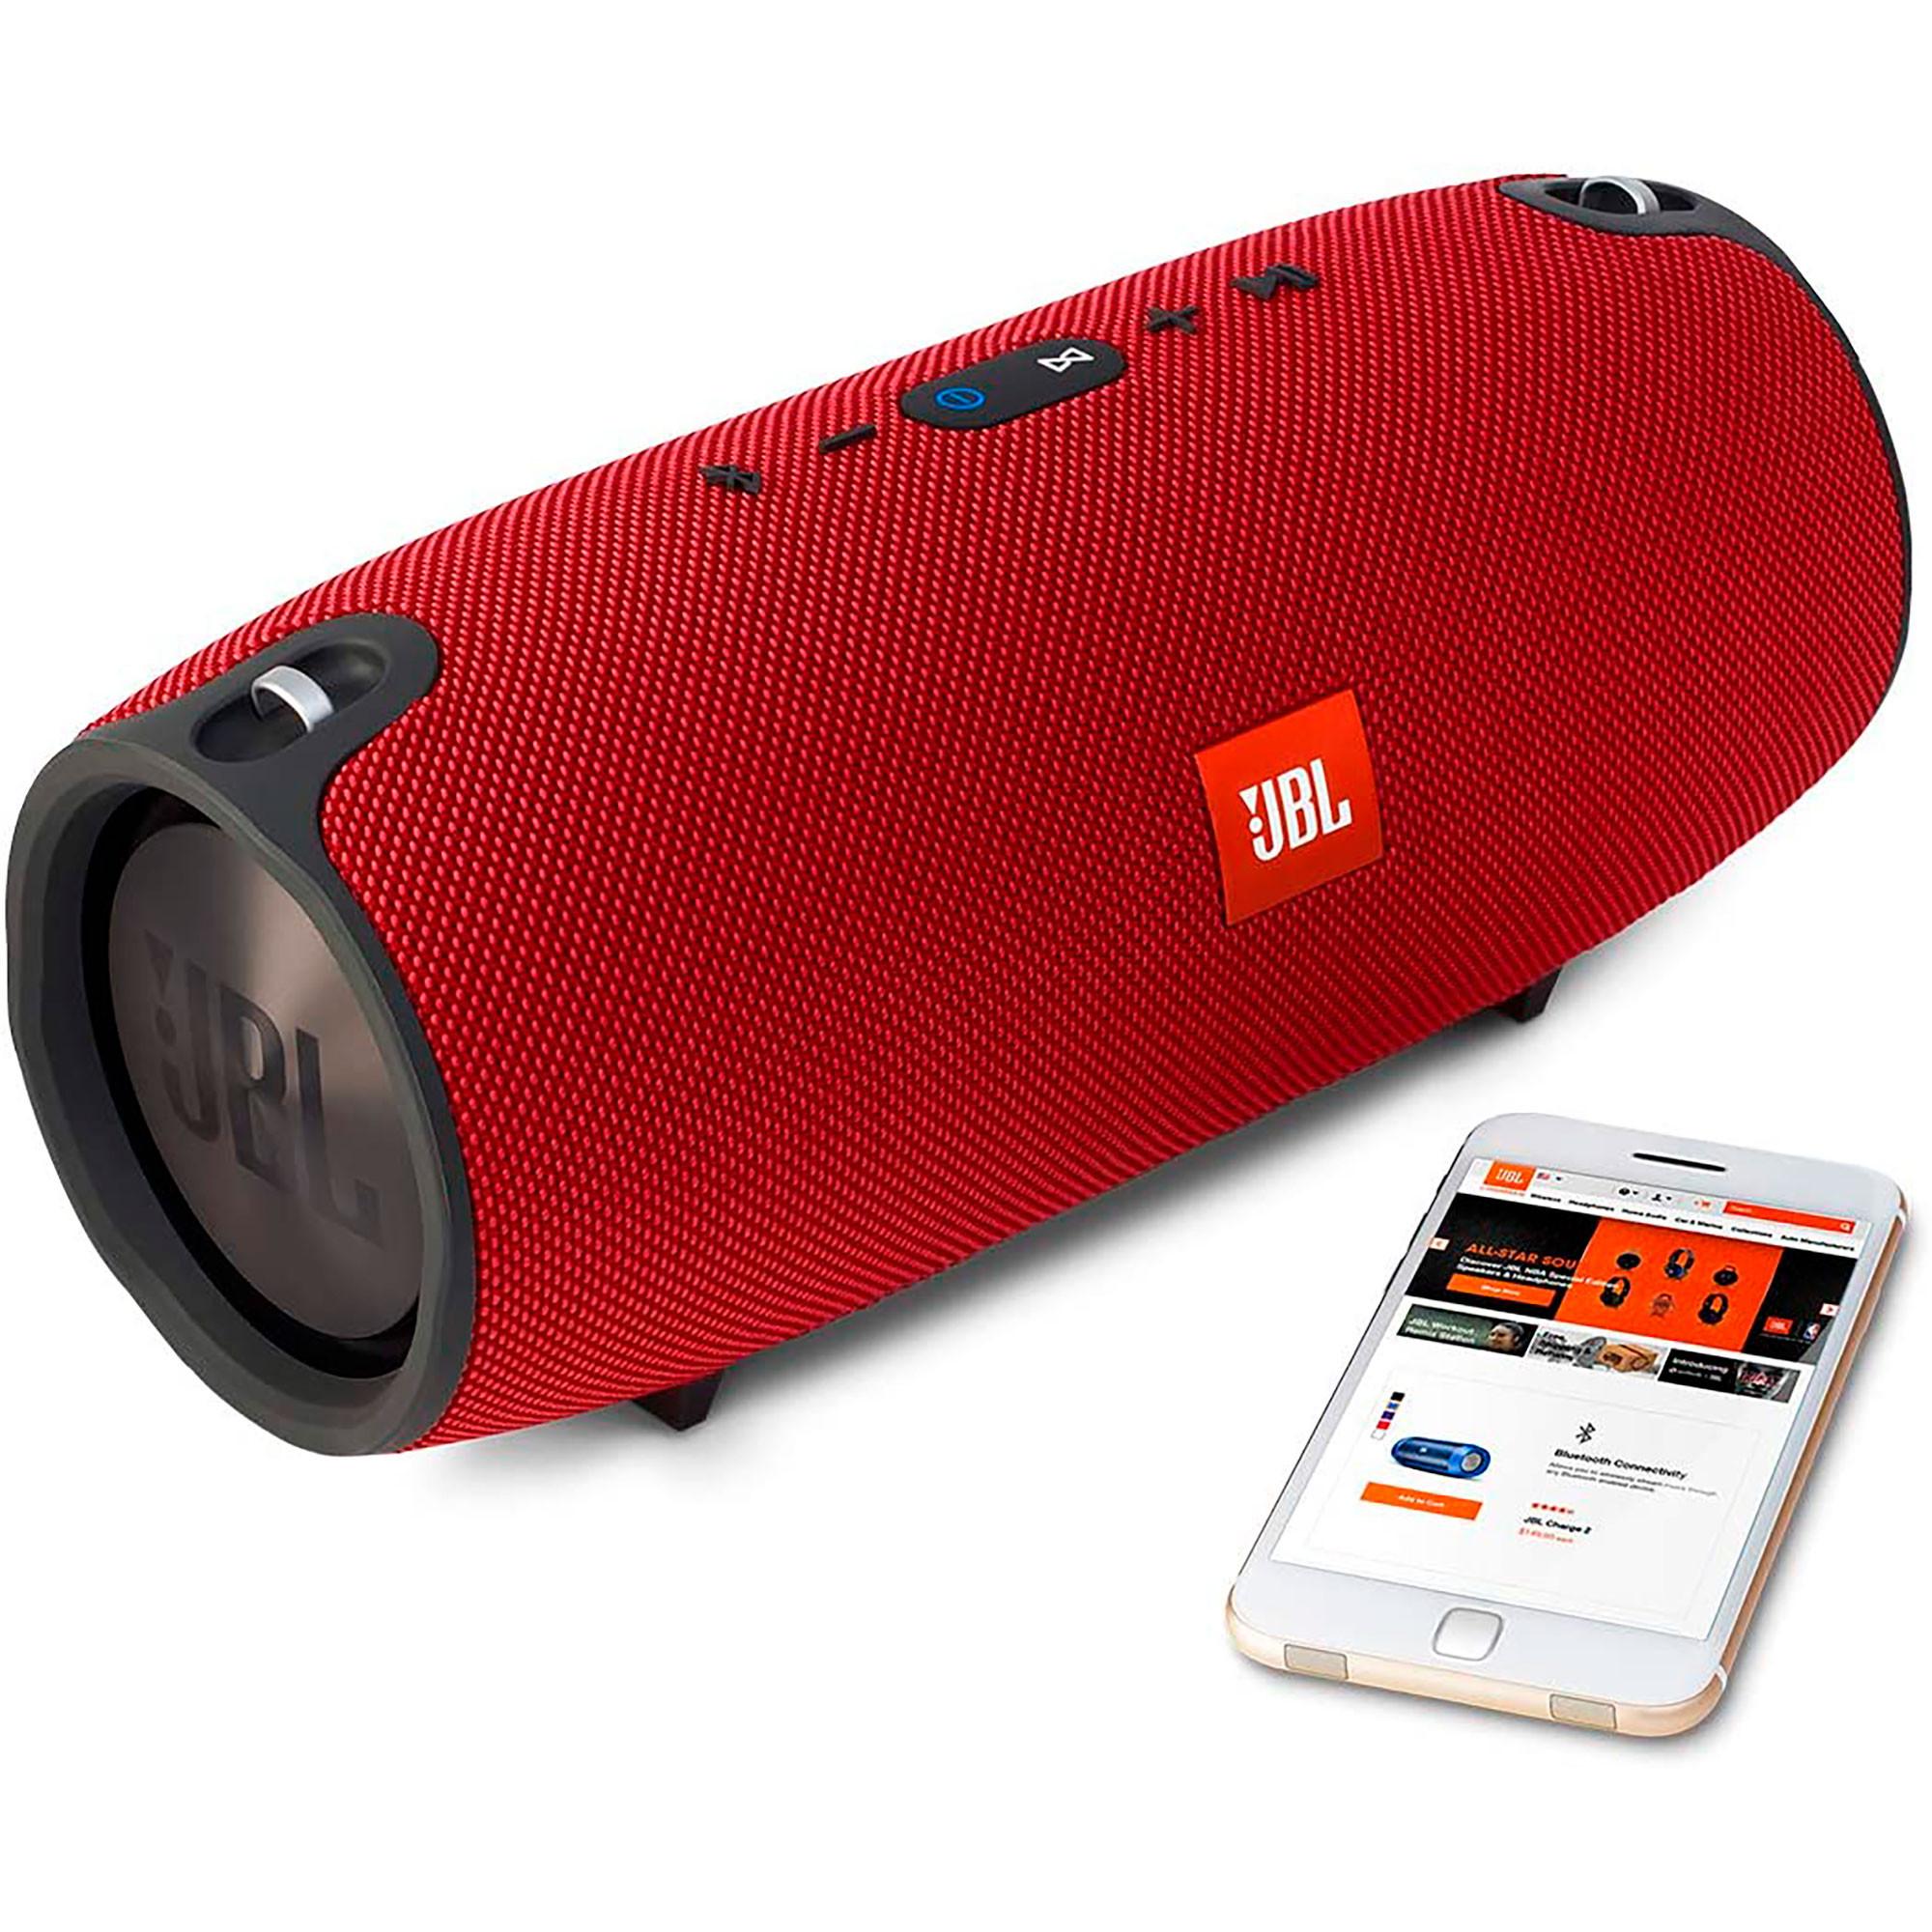 JBL Xtreme Altavoz Portátil, Bluetooth, Manos Libres, Potencia Sonido 40W, Impermeable, Inalámbrico, Rojo